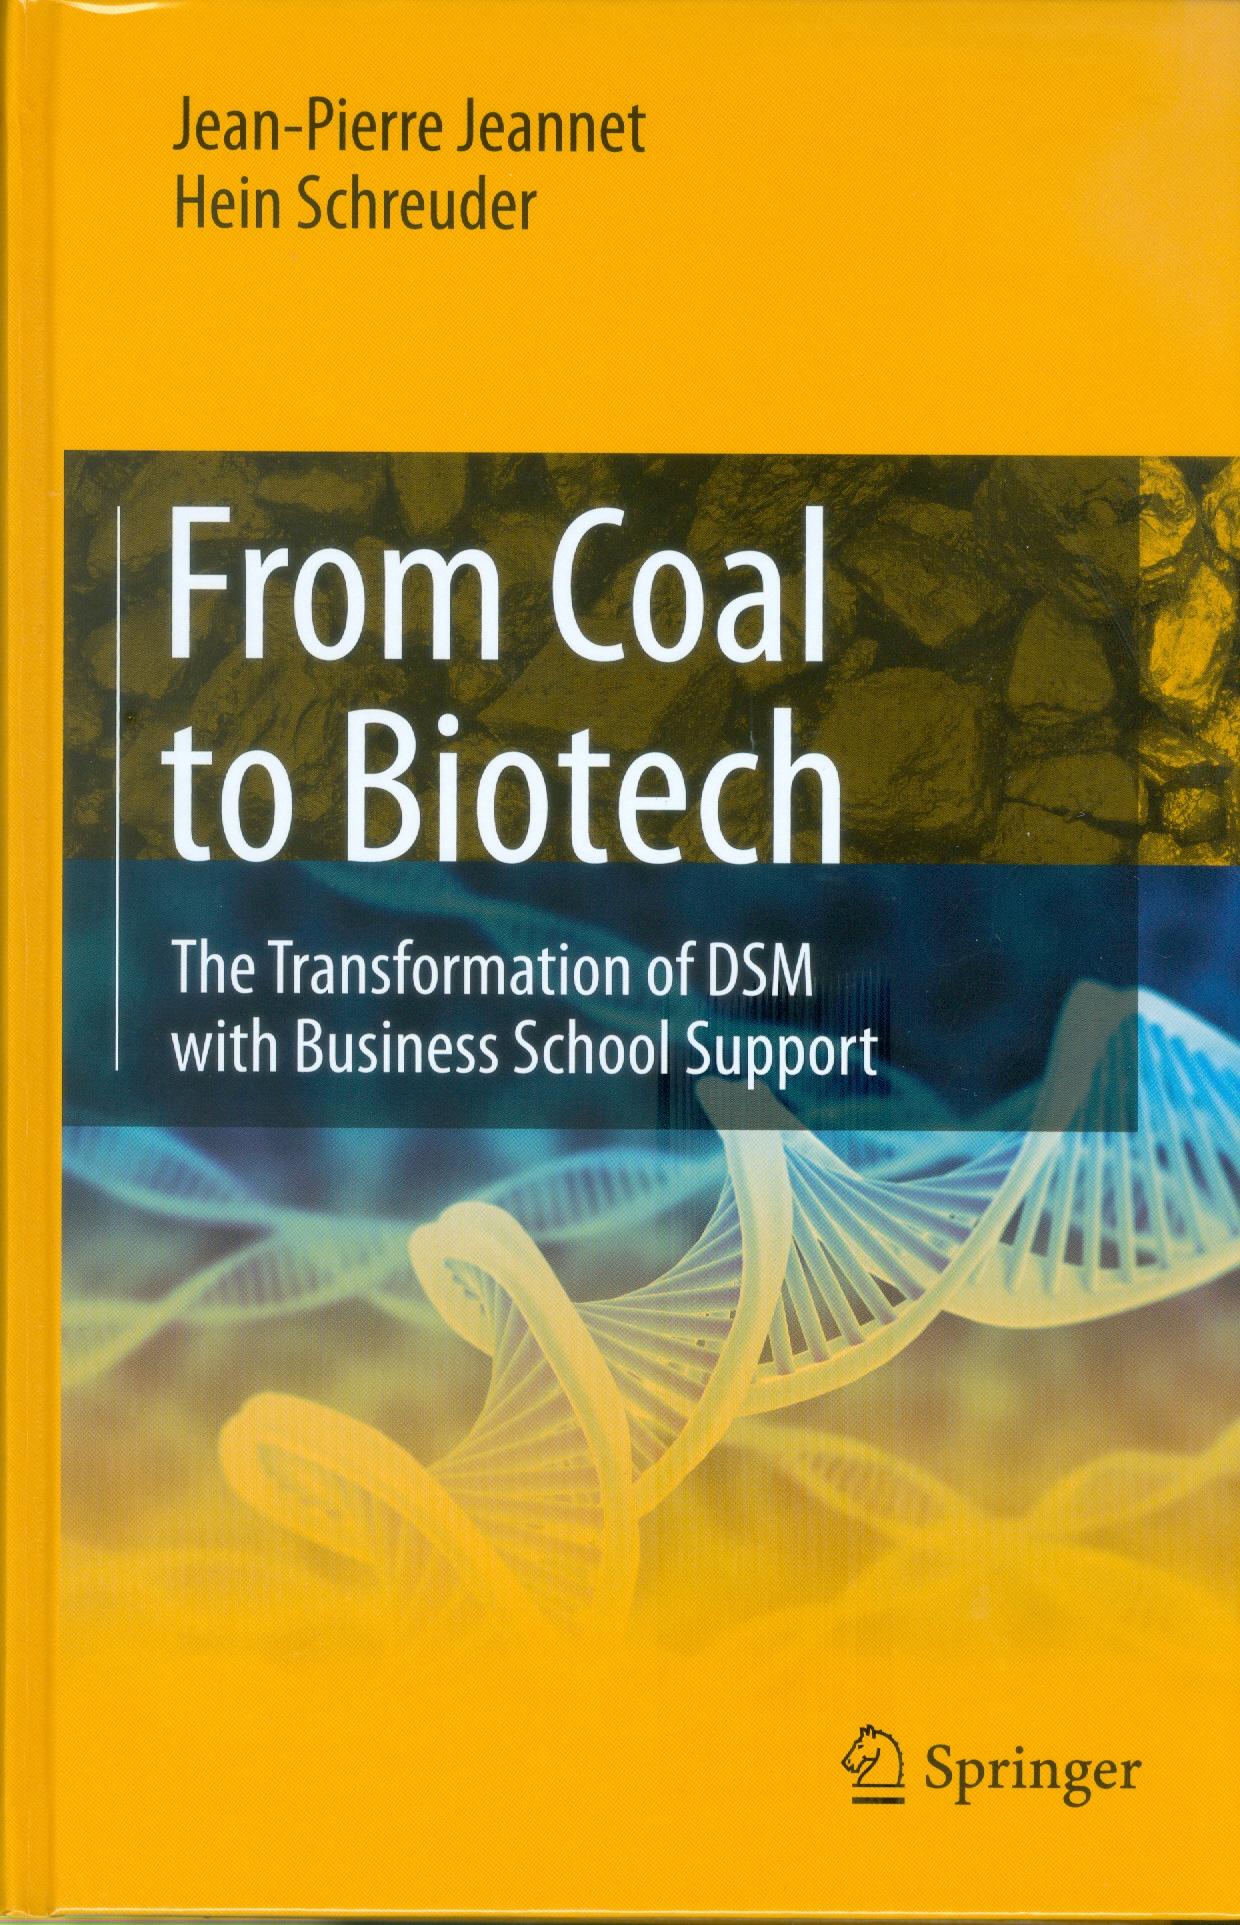 From Coal To Biotech0001.jpg